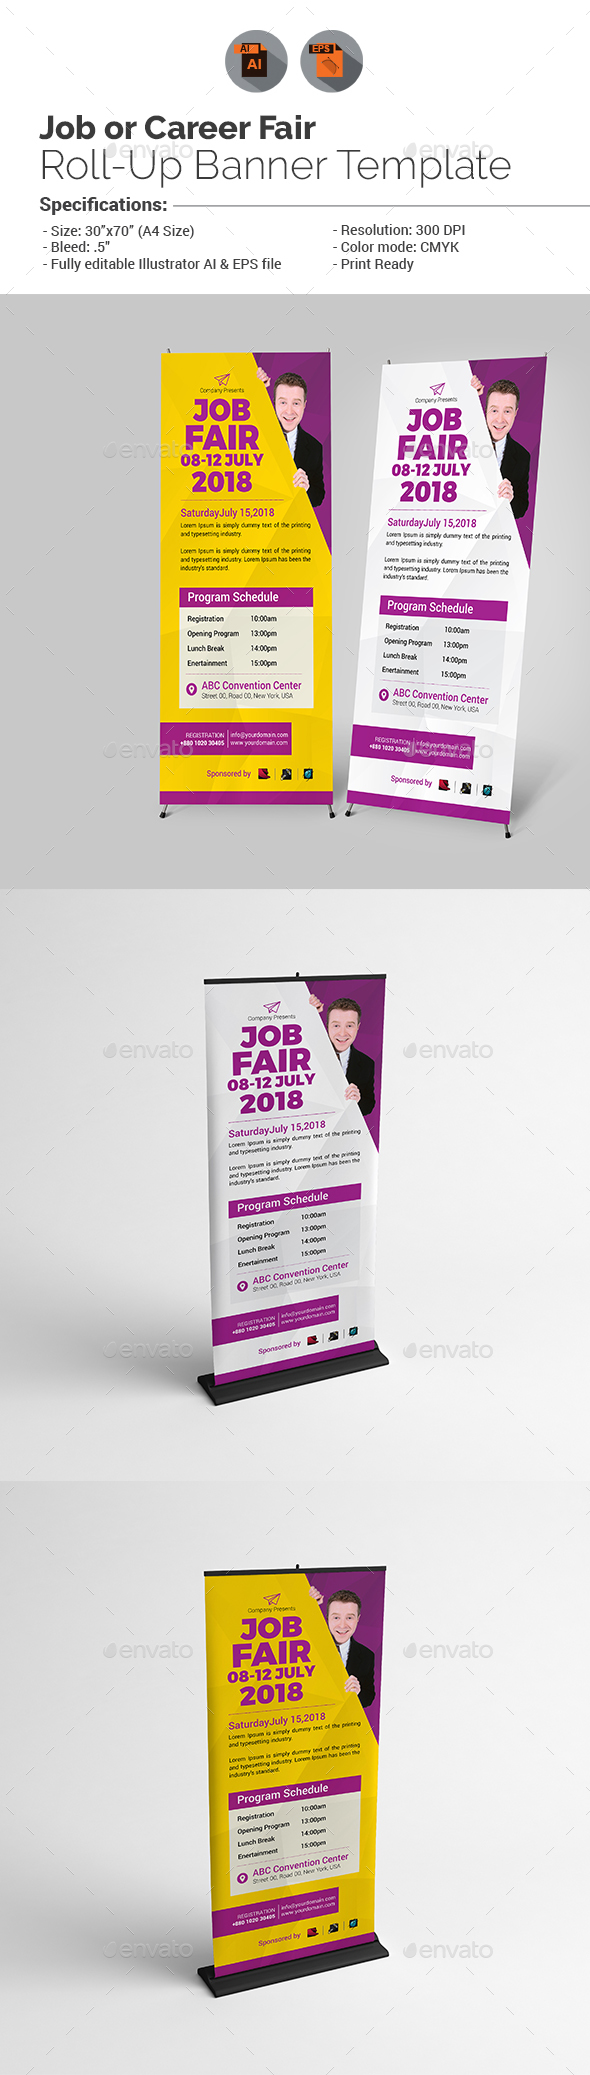 job fair roll up banner template v1 by aam360 graphicriver. Black Bedroom Furniture Sets. Home Design Ideas